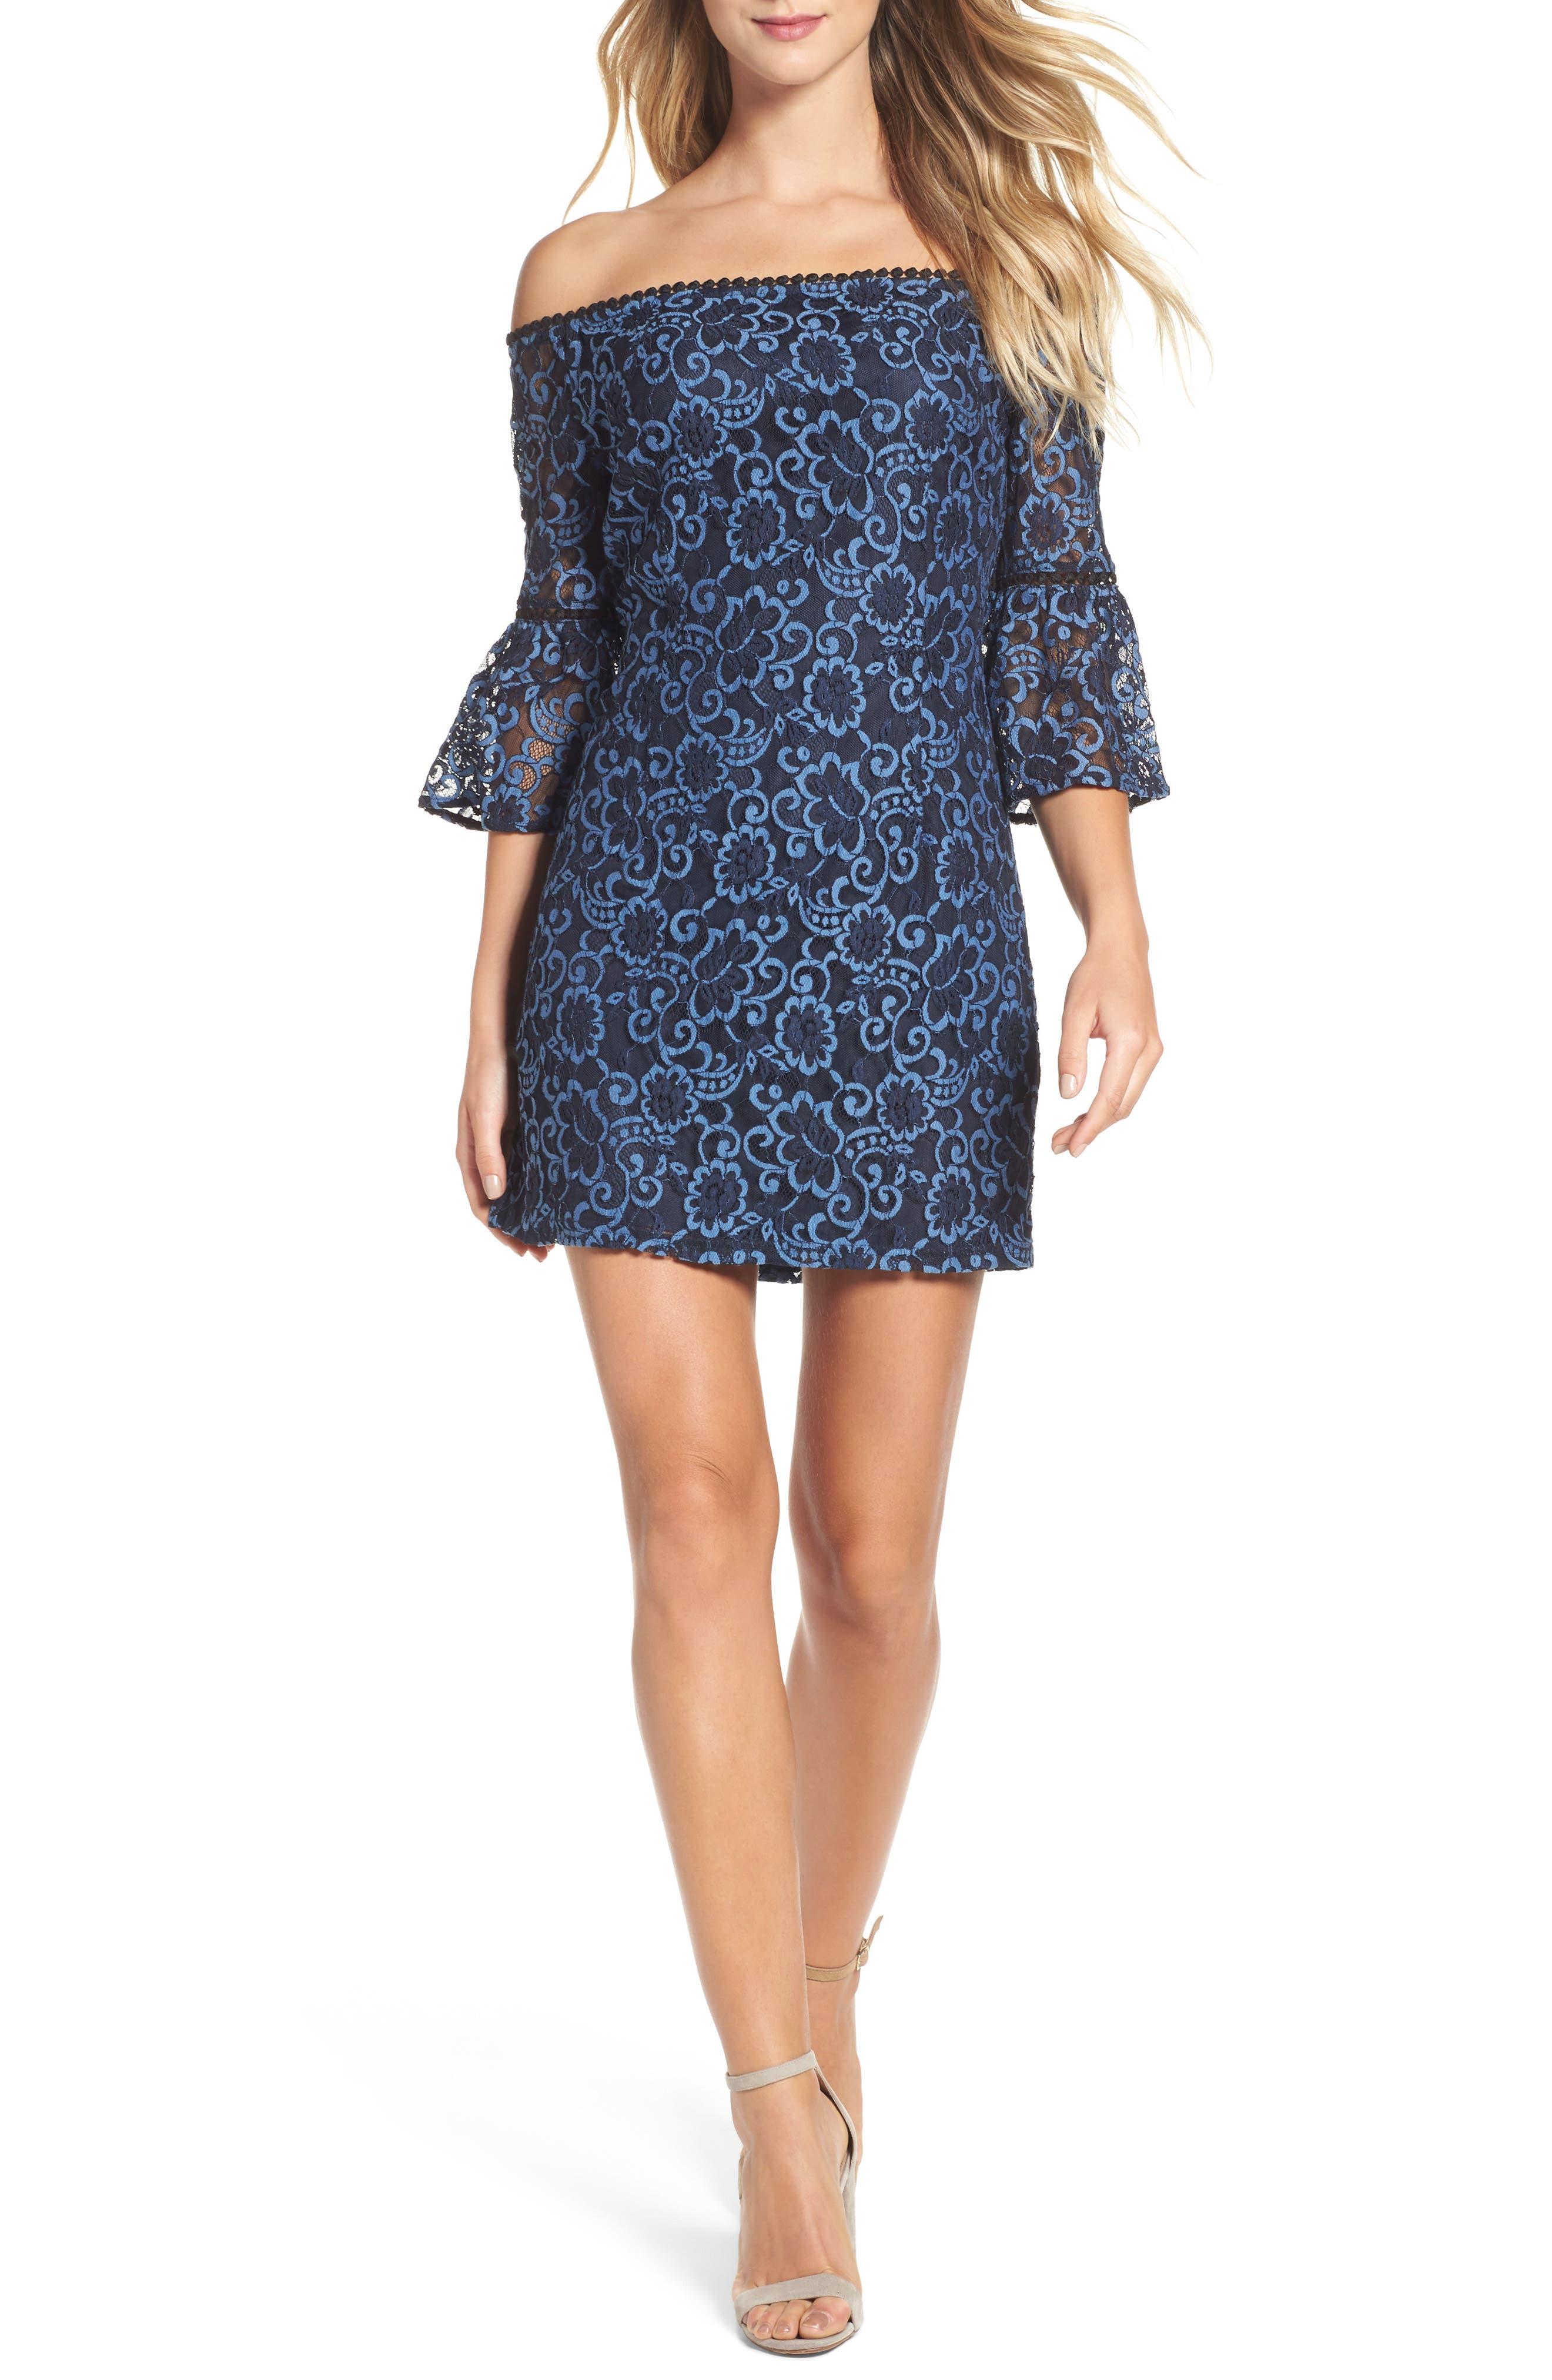 BB Dakota Danlyn Off the Shoulder Lace Minidress